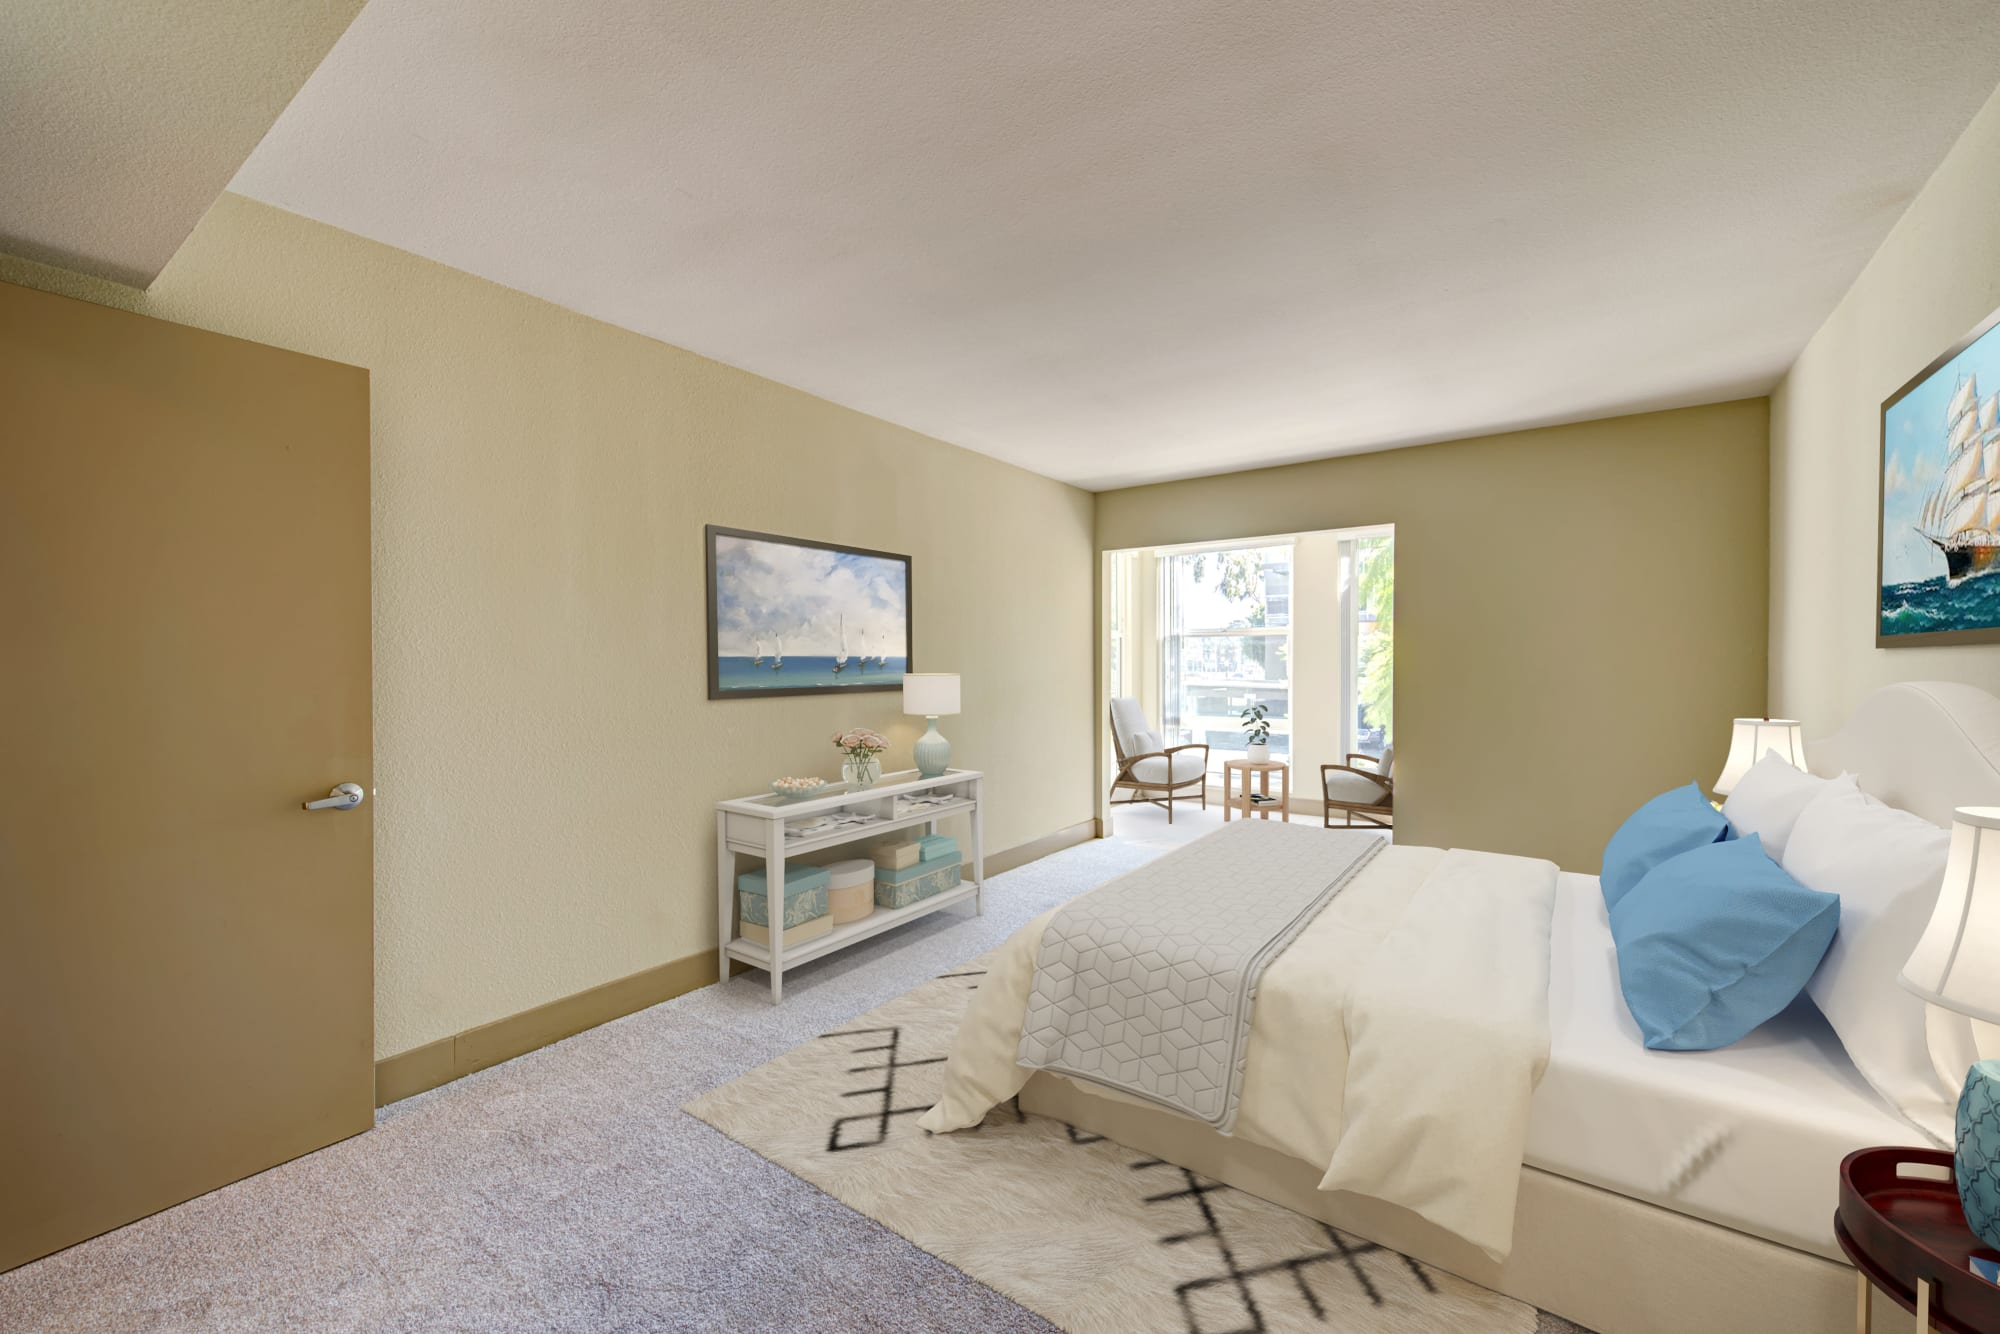 Views from Harborside Marina Bay Apartments in Marina del Rey, California